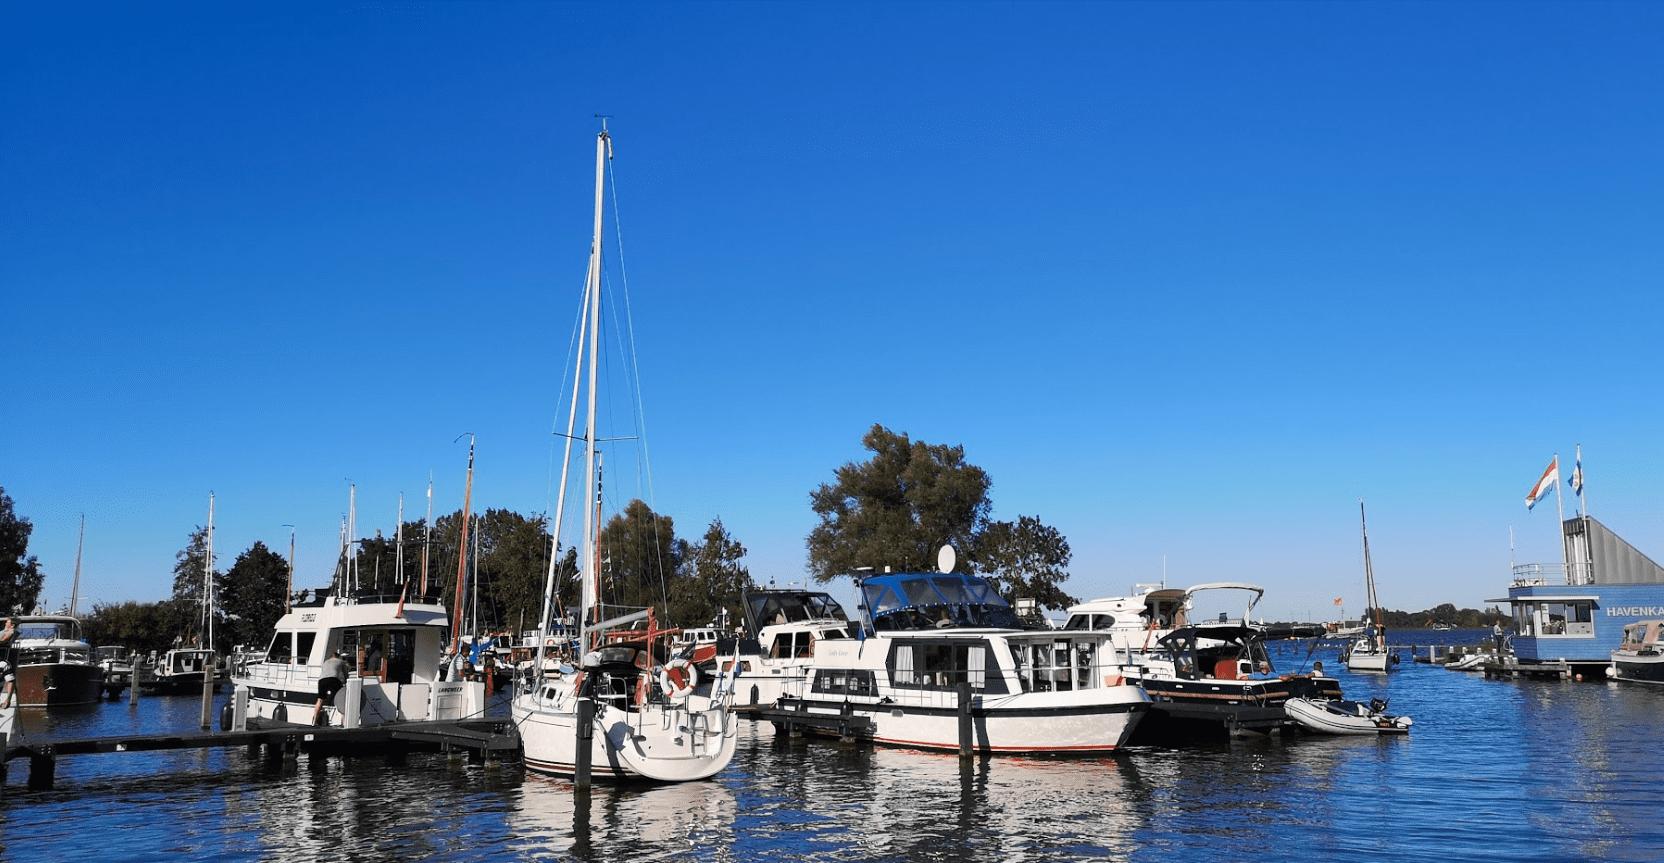 Toerisme zorgt voor reuring in Fryslân